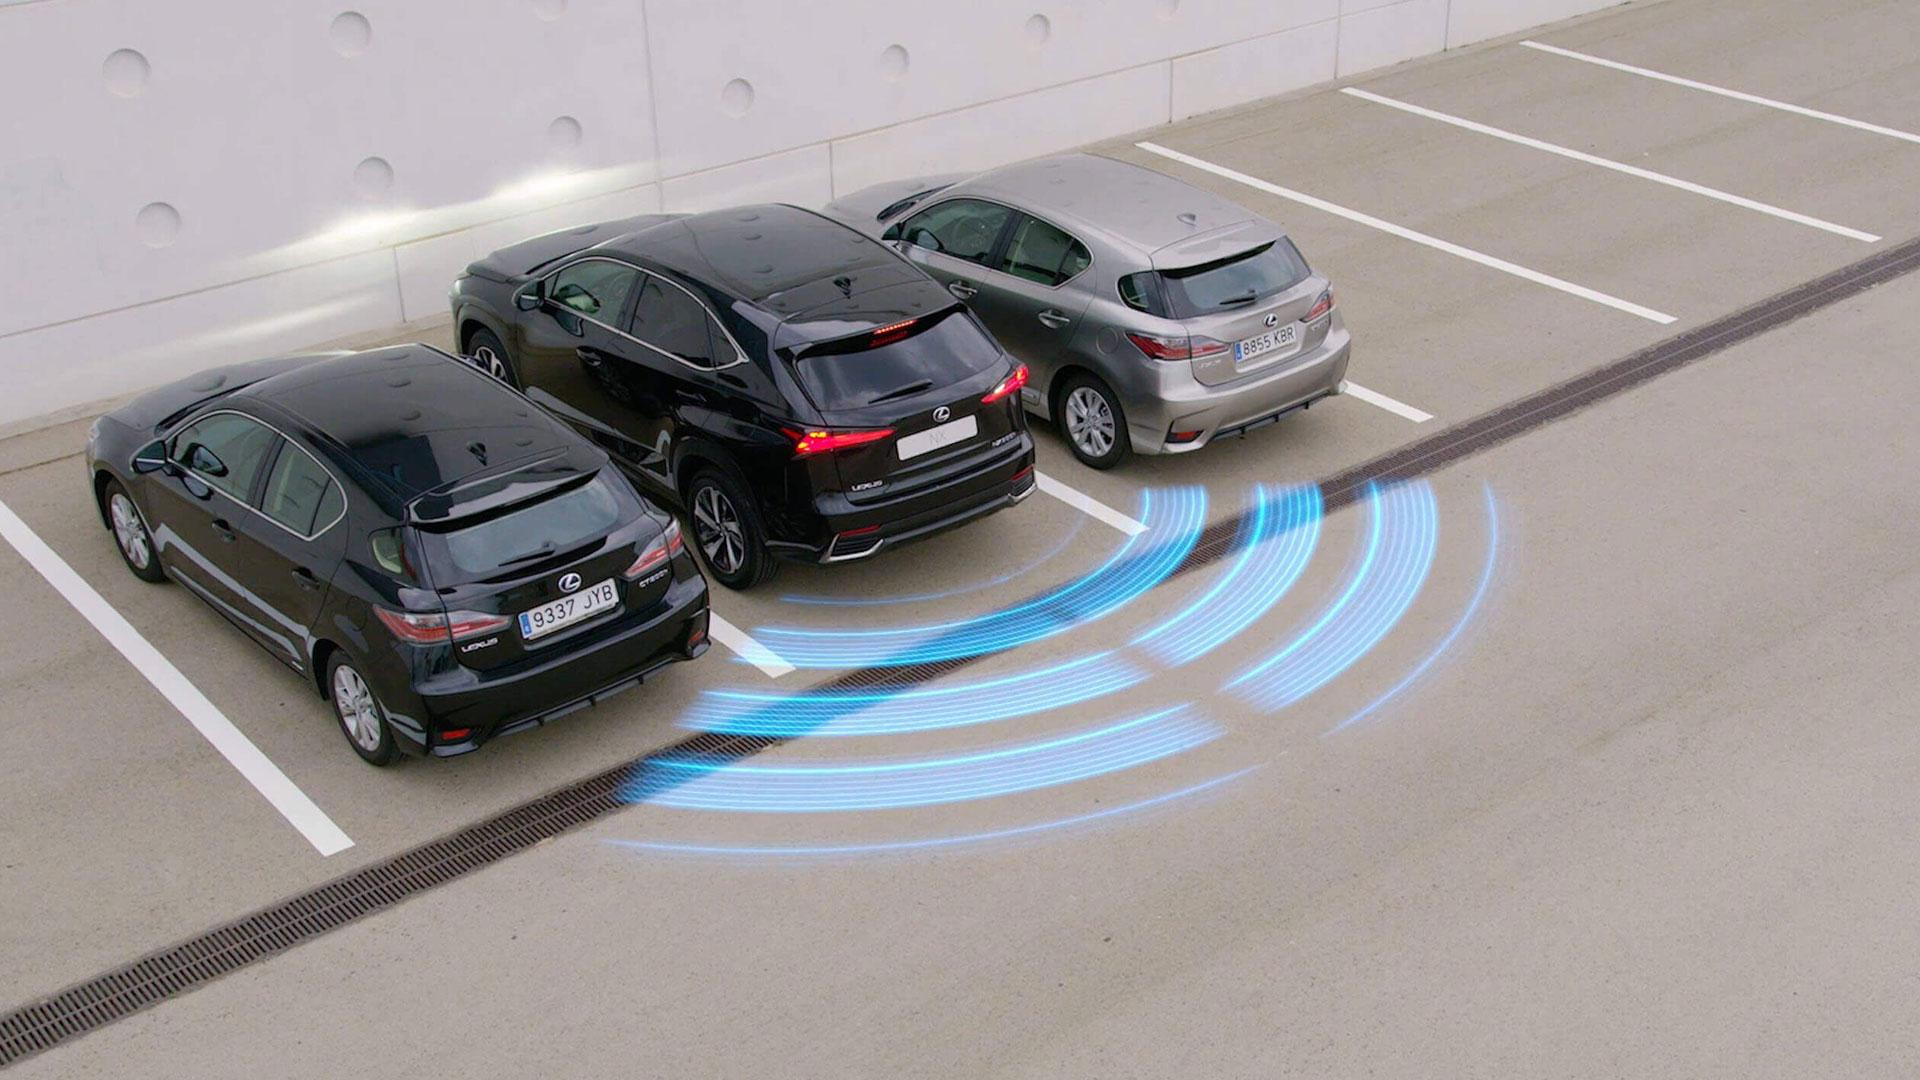 5 Lexus safety system image